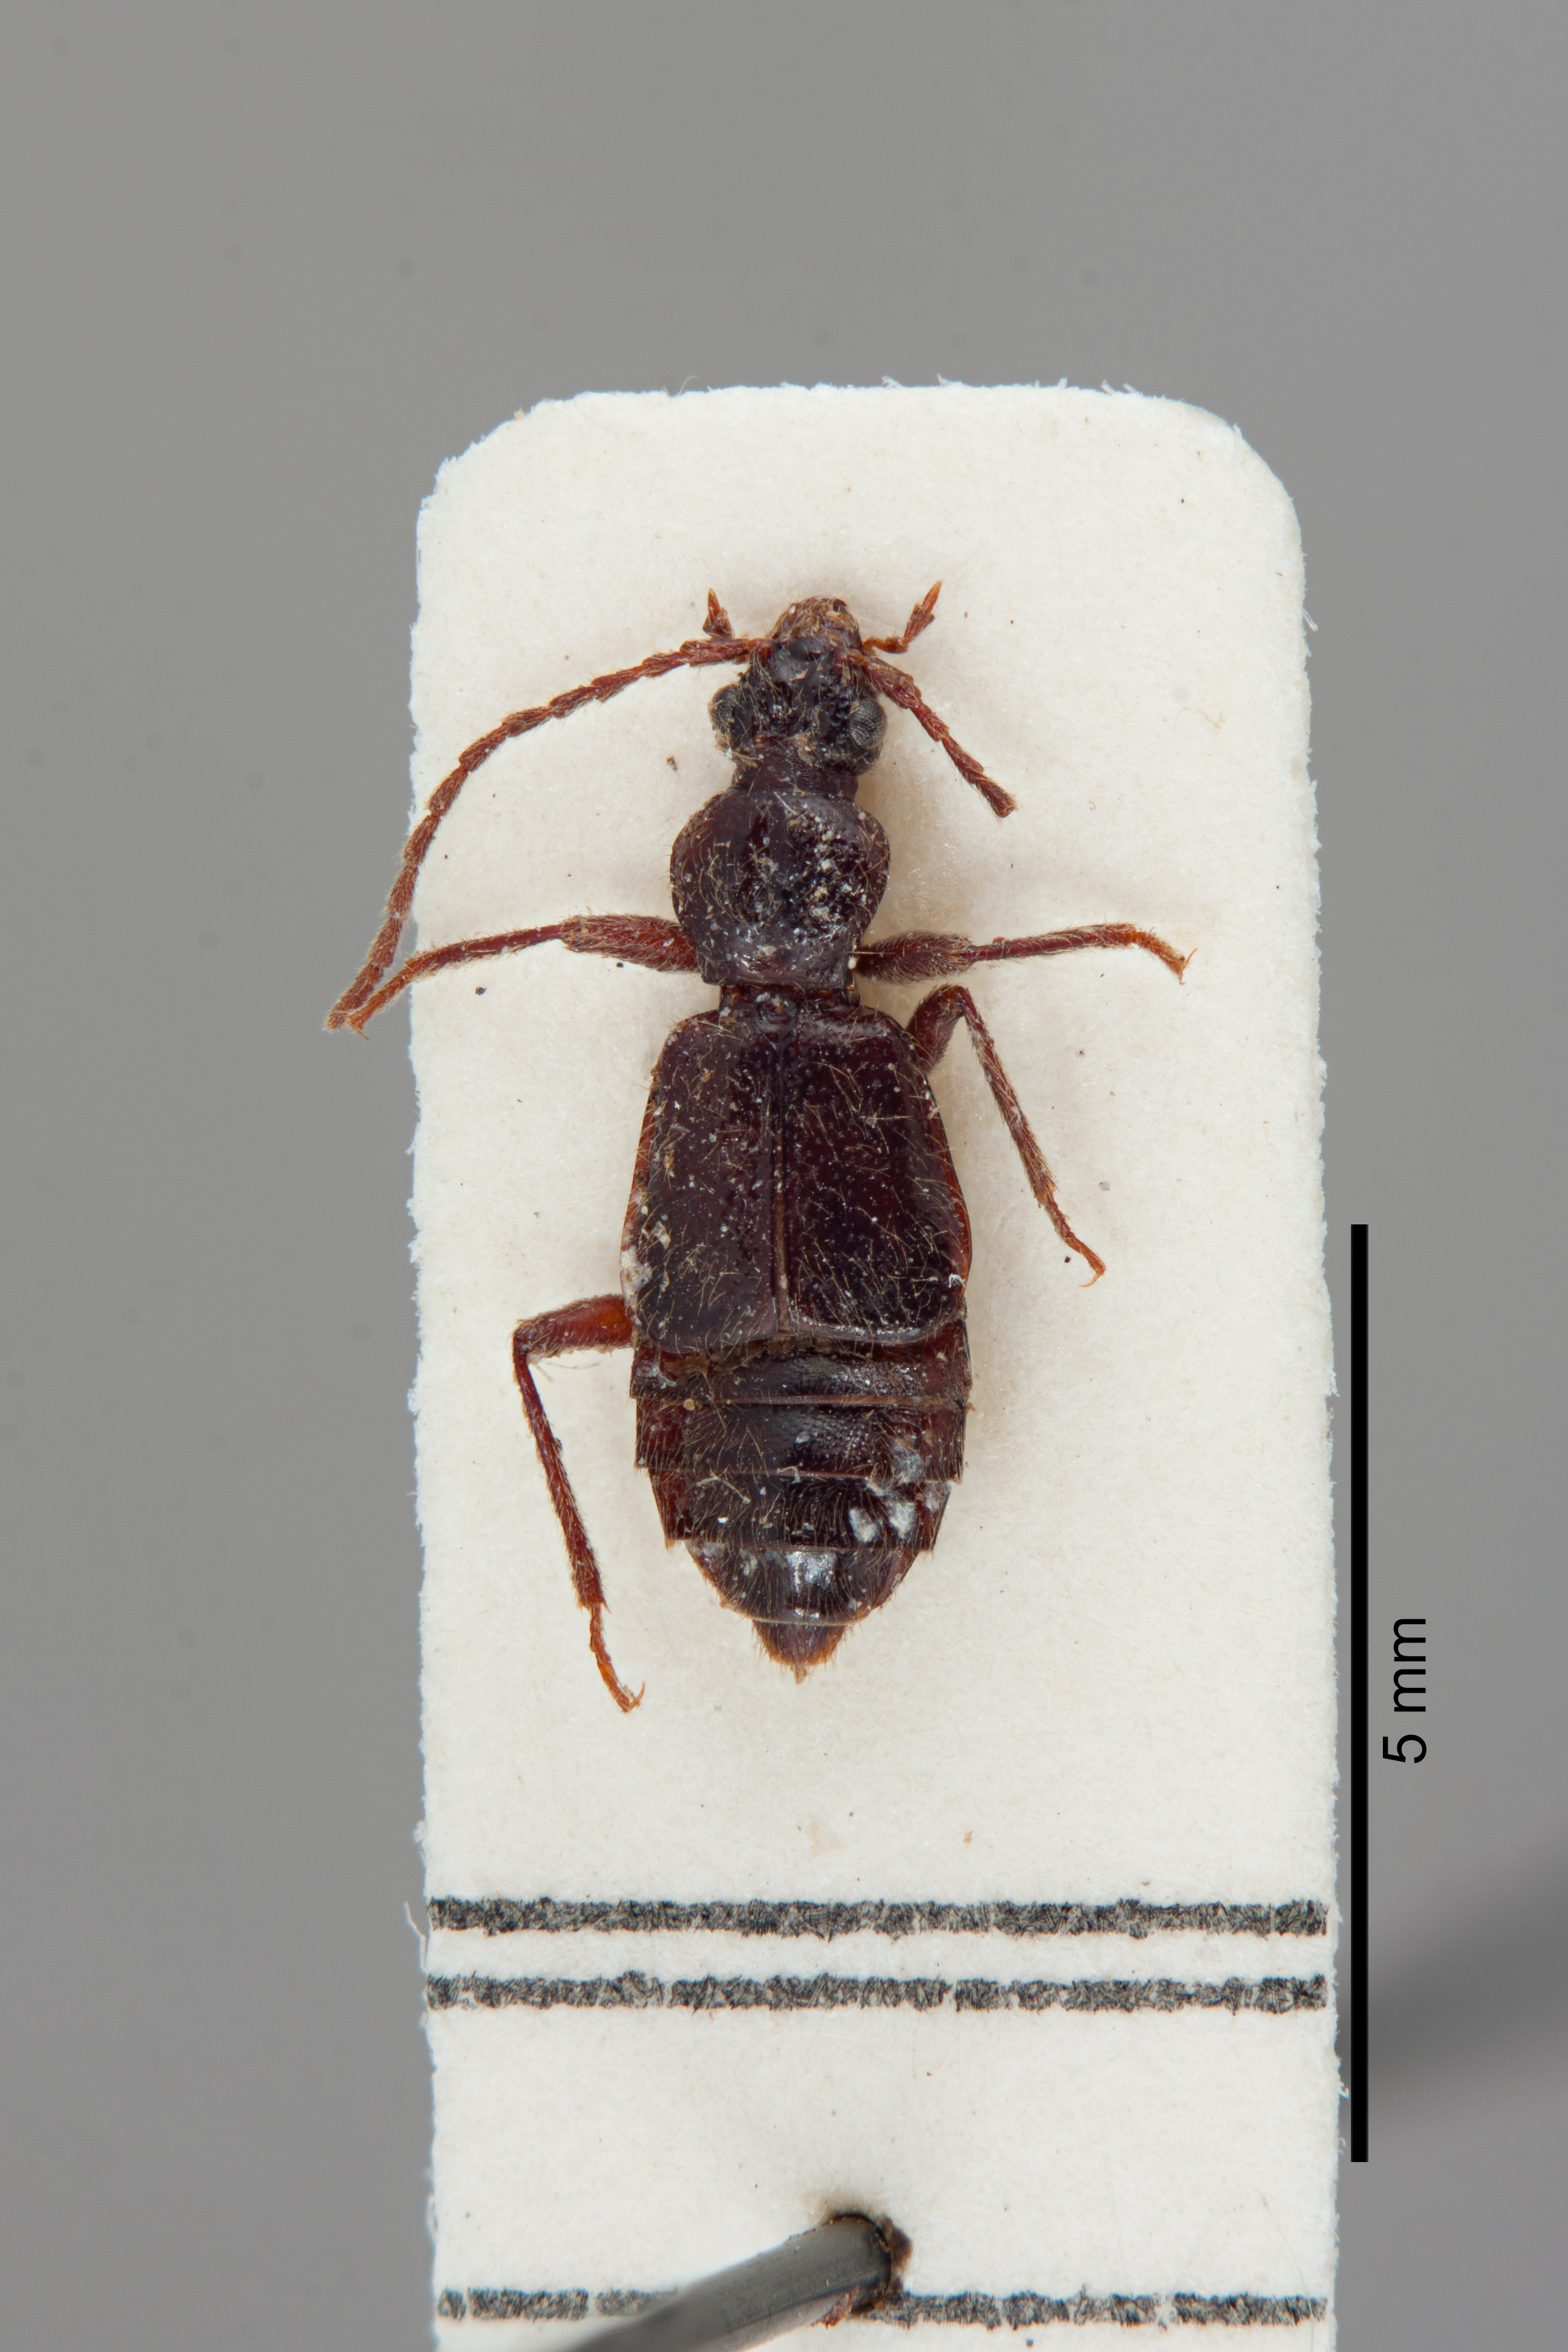 Image of Geodromicus szechwanensis